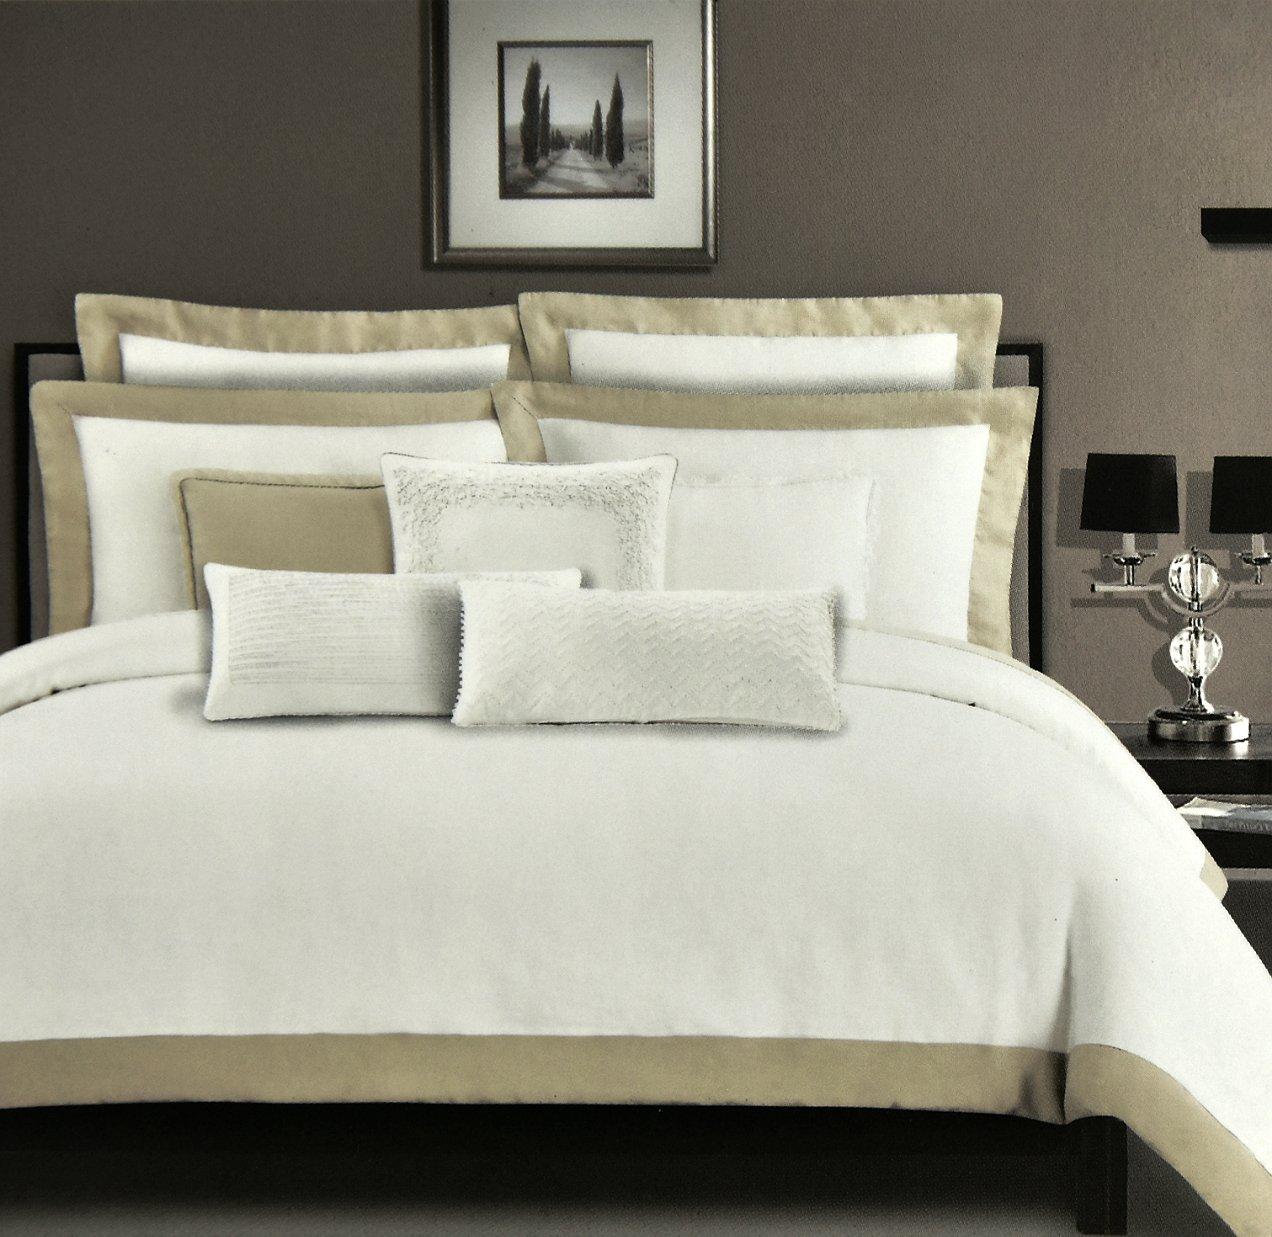 Tahari Sheets Sale: Tahari Stone Washed Pure Linen Luxury Duvet Cover 3pc